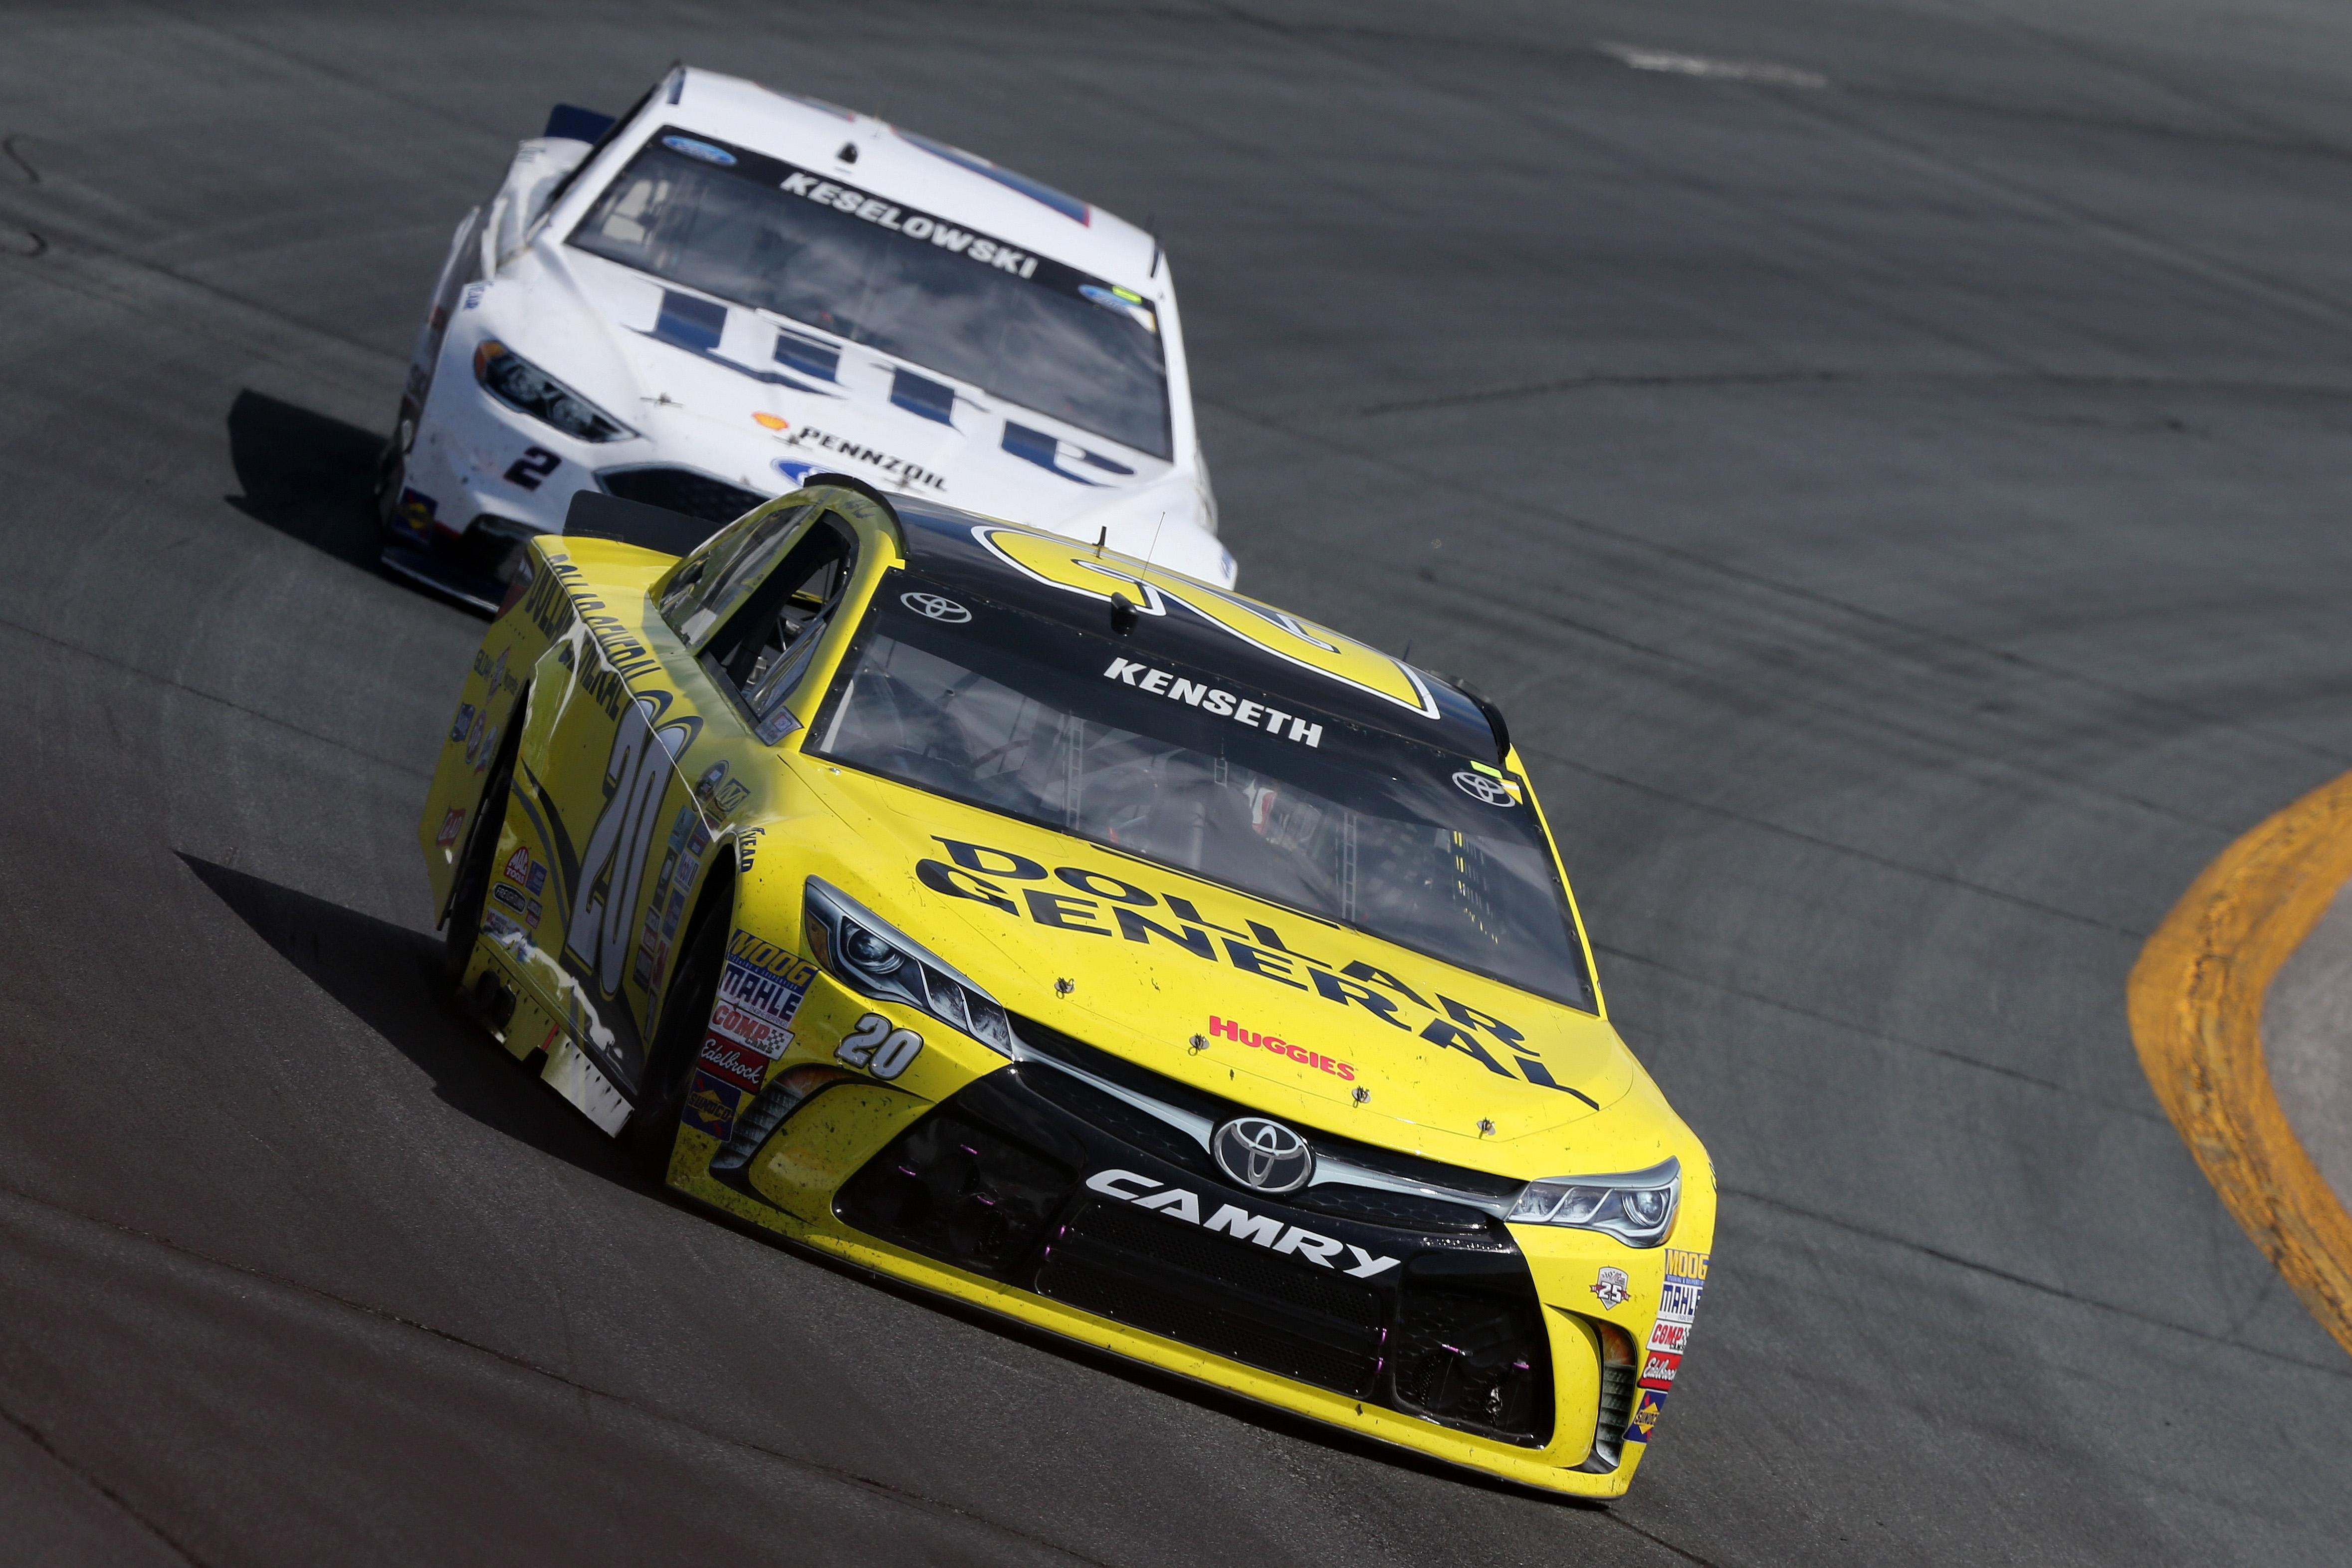 Bad blood boils as NASCAR's Chase playoffs begin